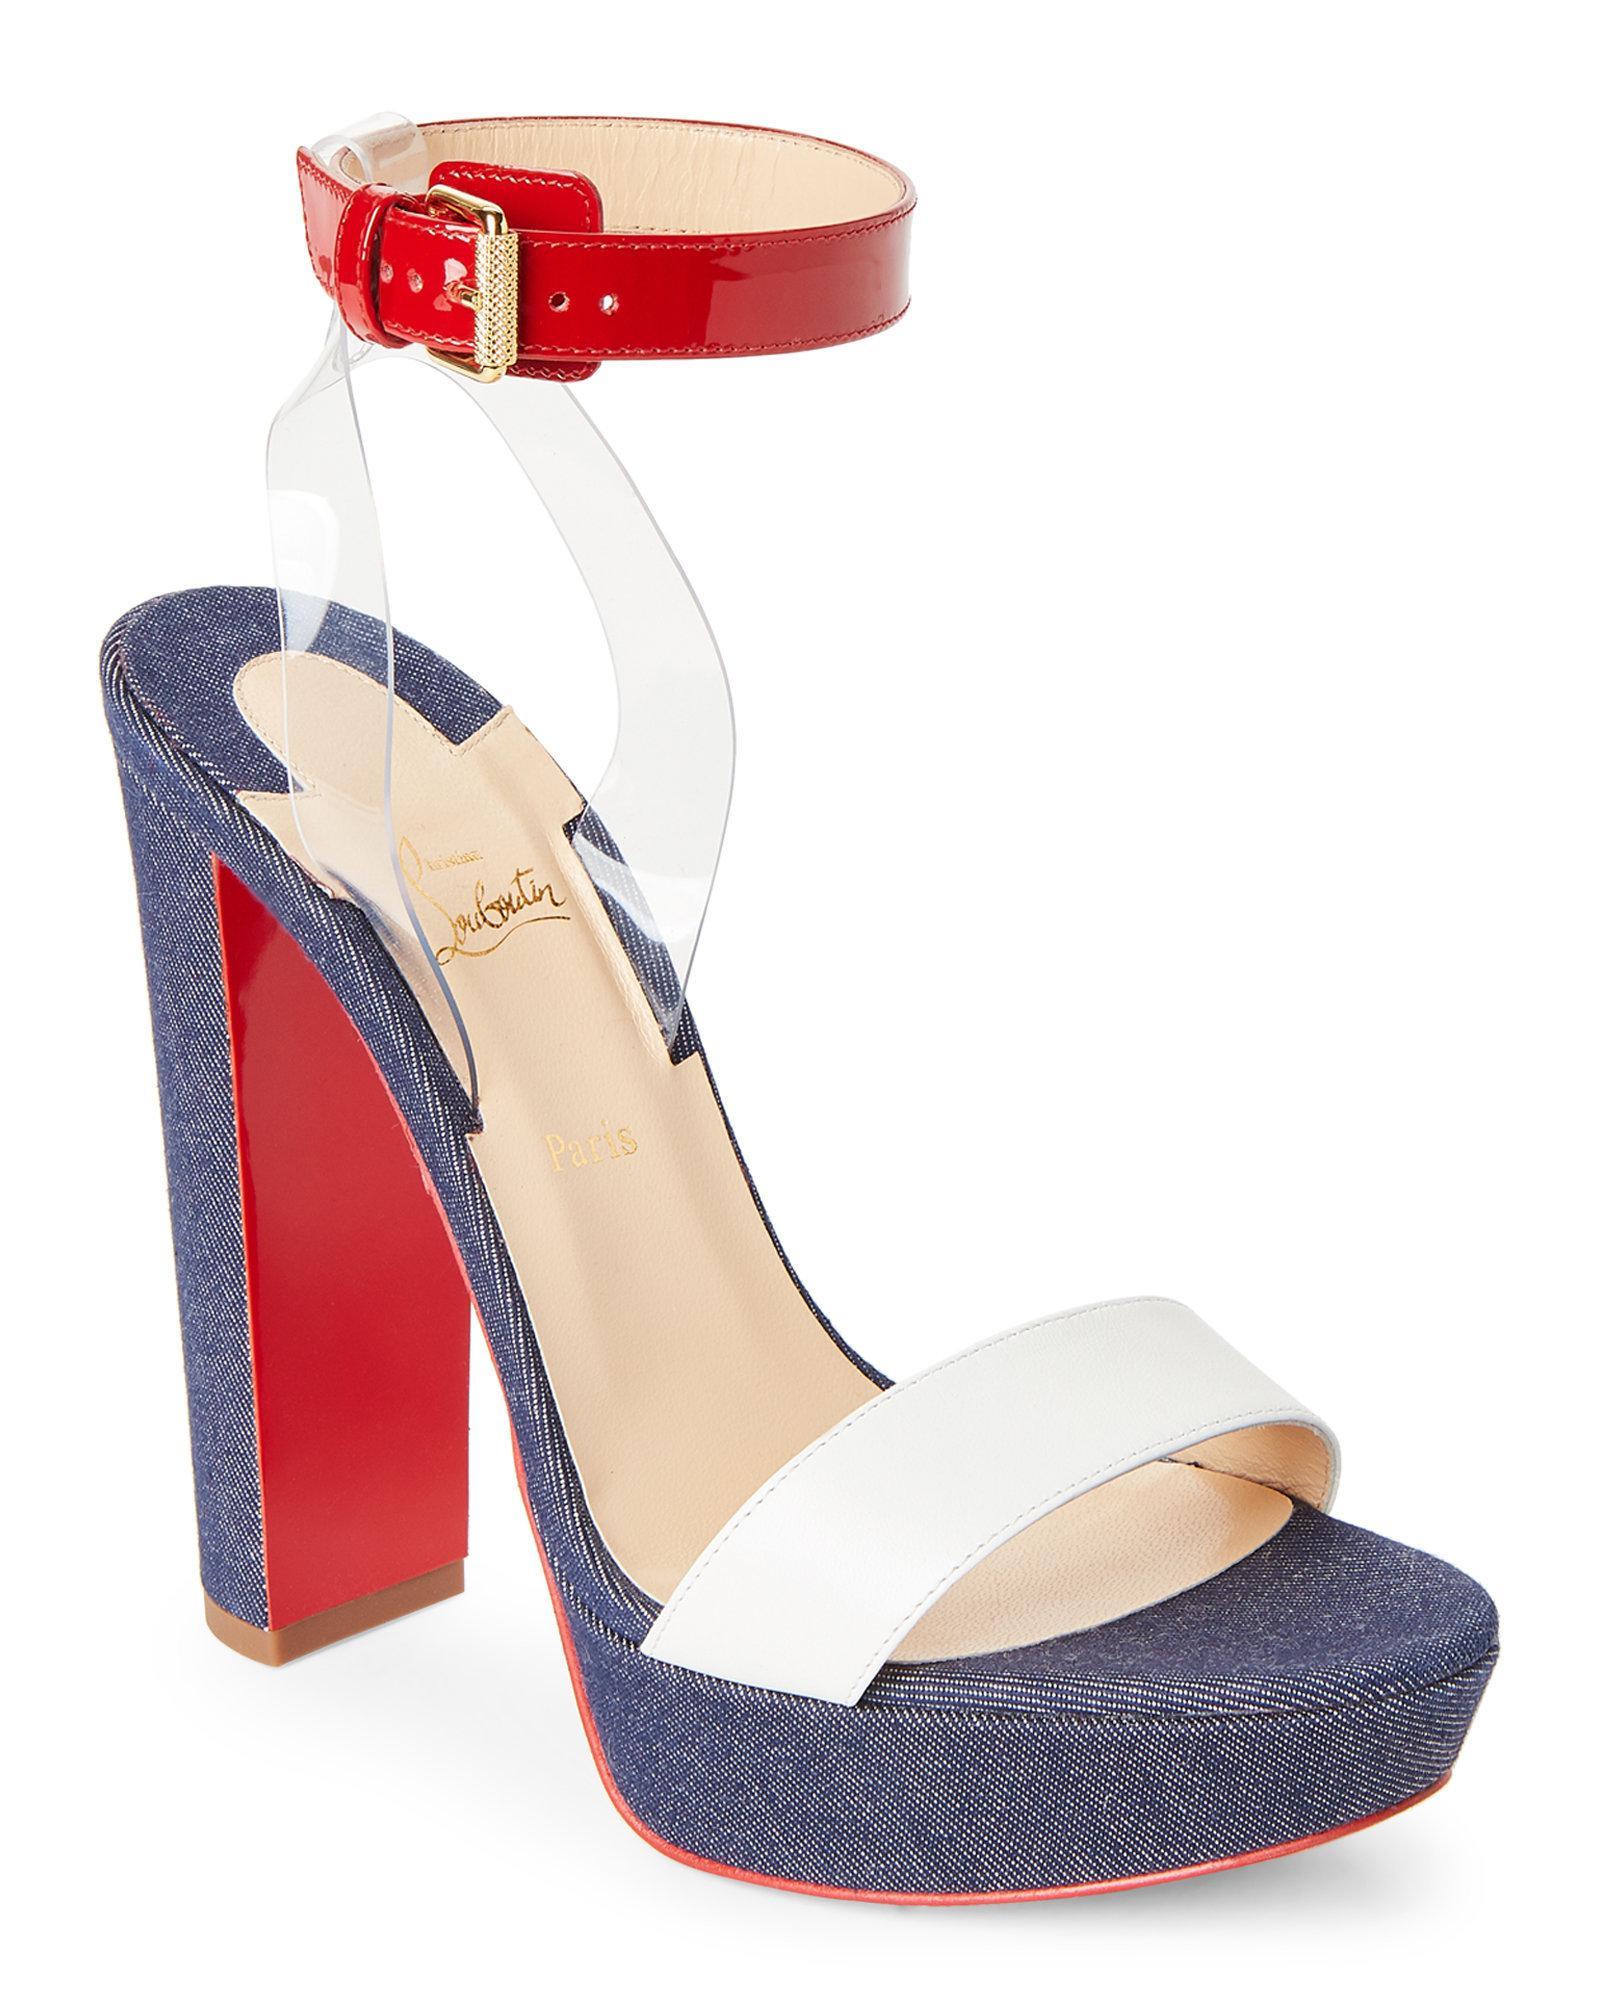 233540c6236 Christian Louboutin Blue Denim Platform Block Heel Sandals